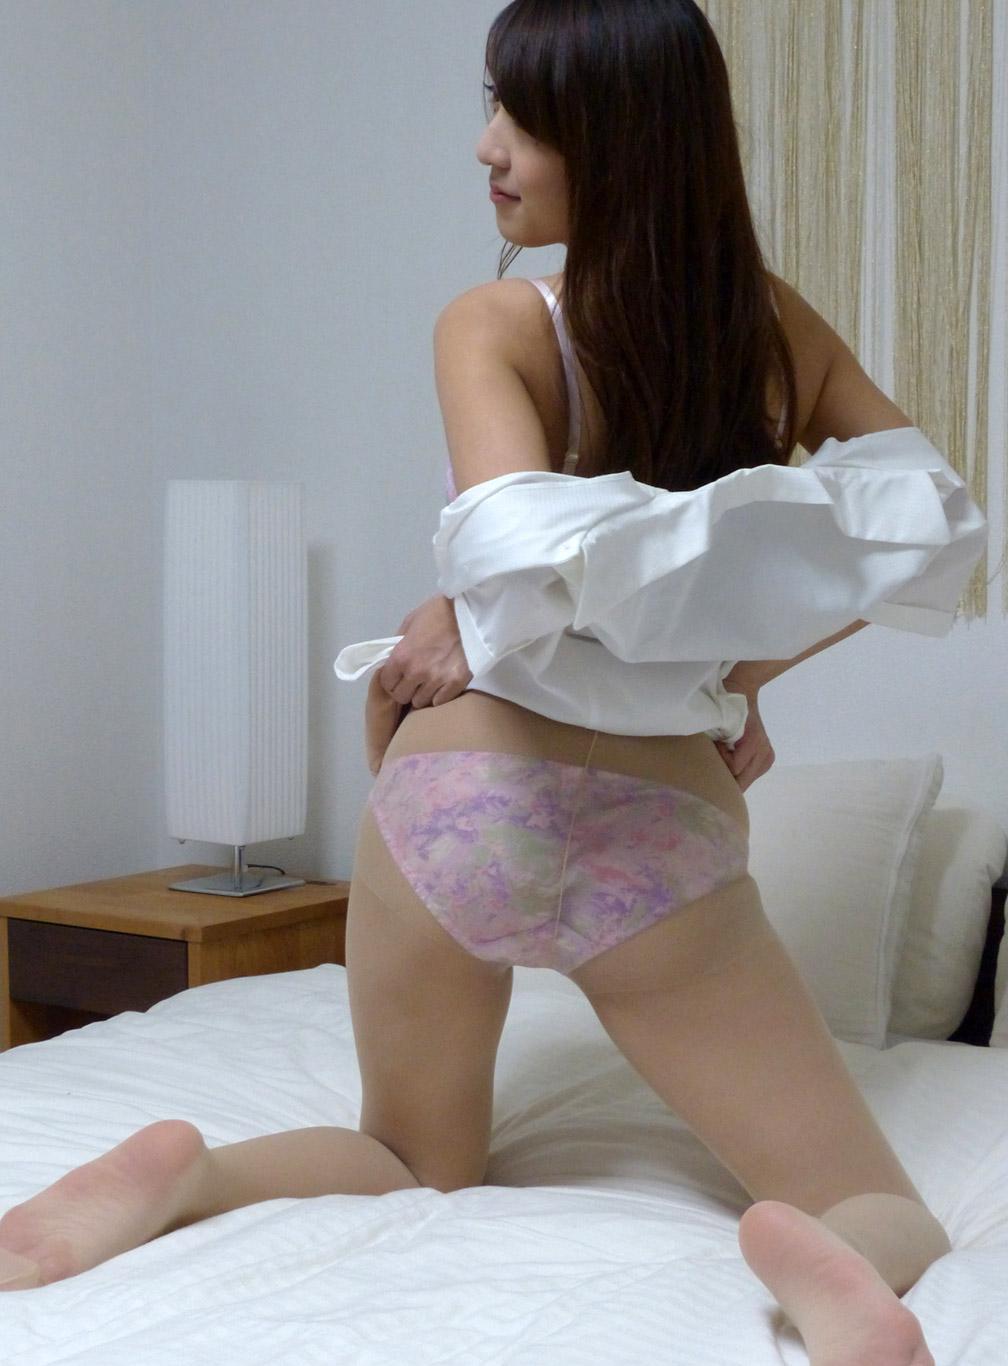 Alycetn Porn Gif japanese javpornpics mobile ria kashii 美少女無料画像の天国